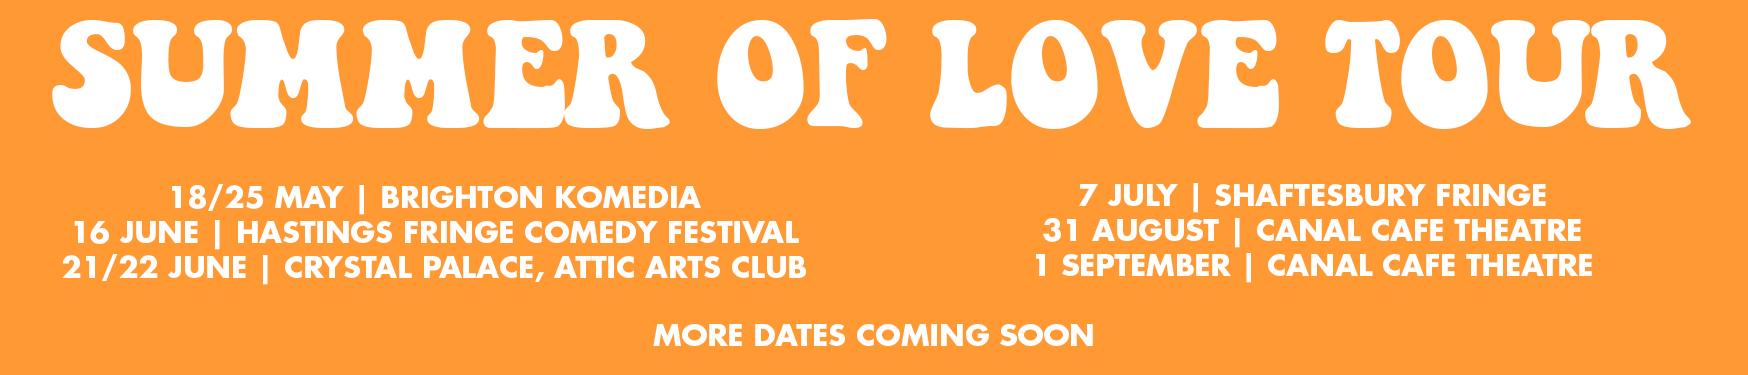 HH Summer of Love Site Banner.jpg